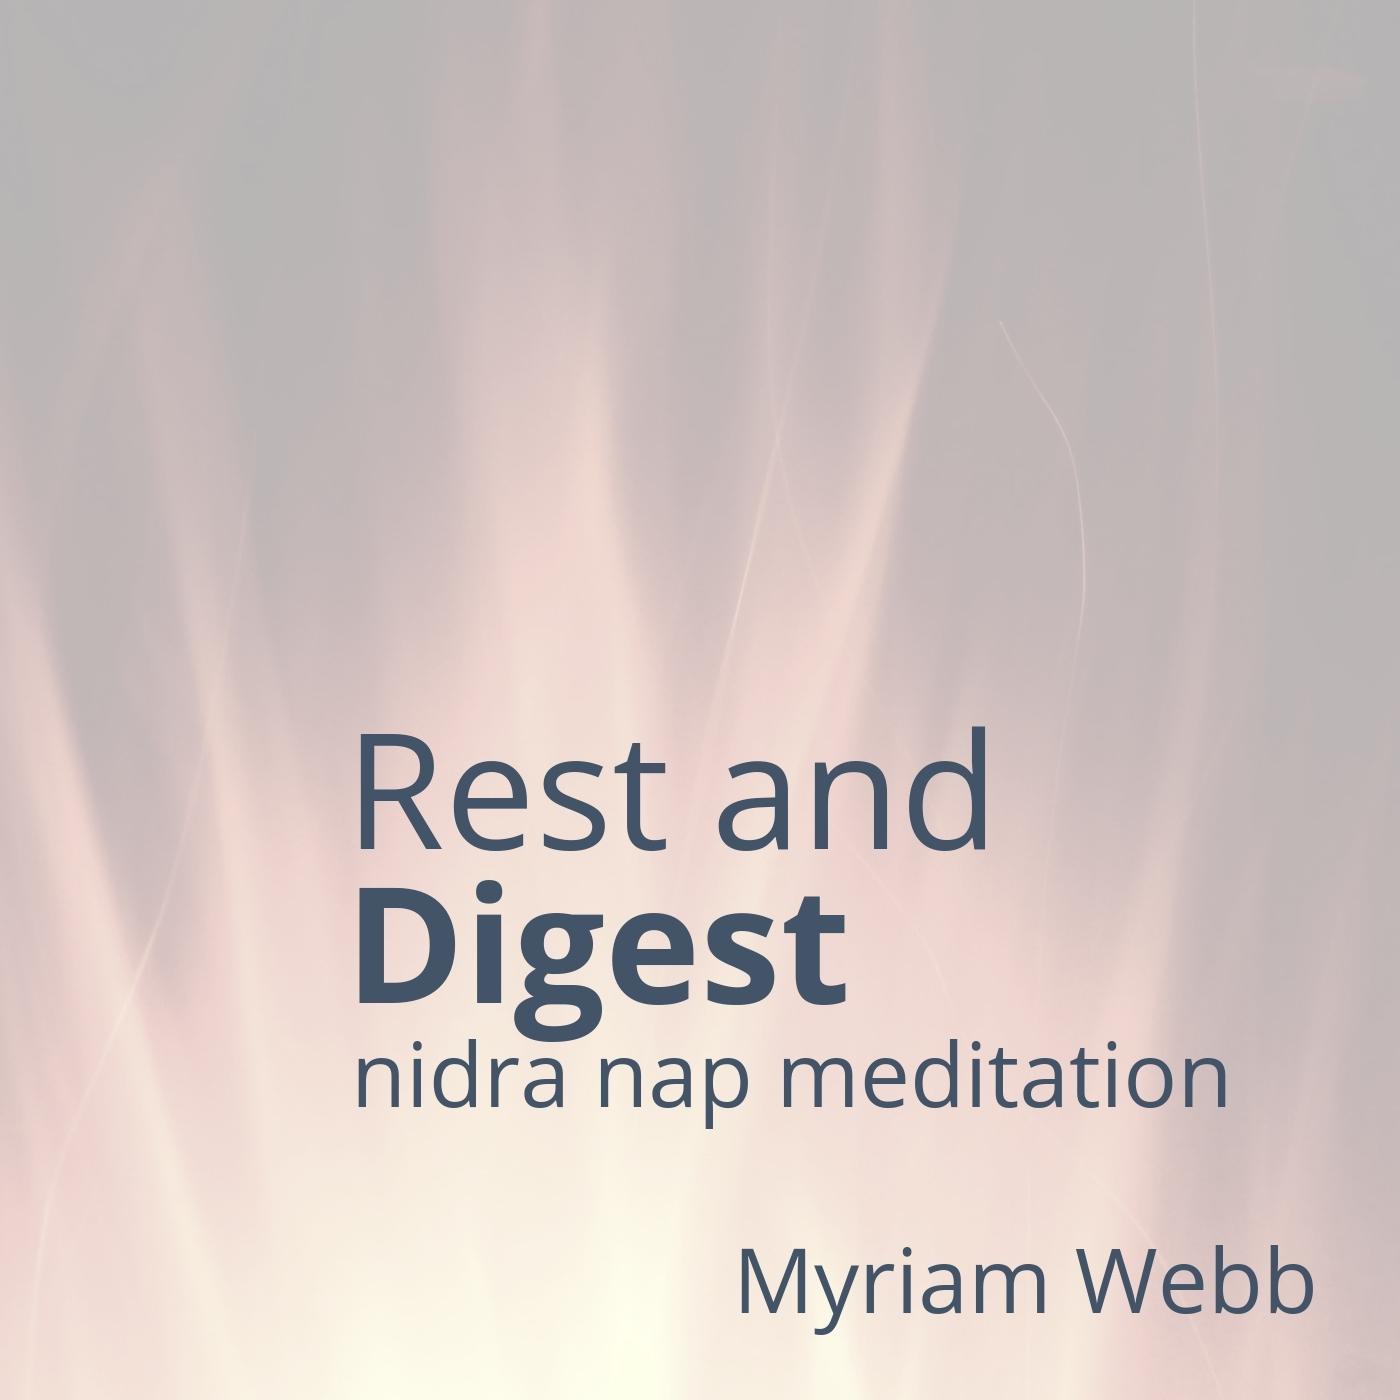 2018 11 Nidra Rest and Digest.jpg